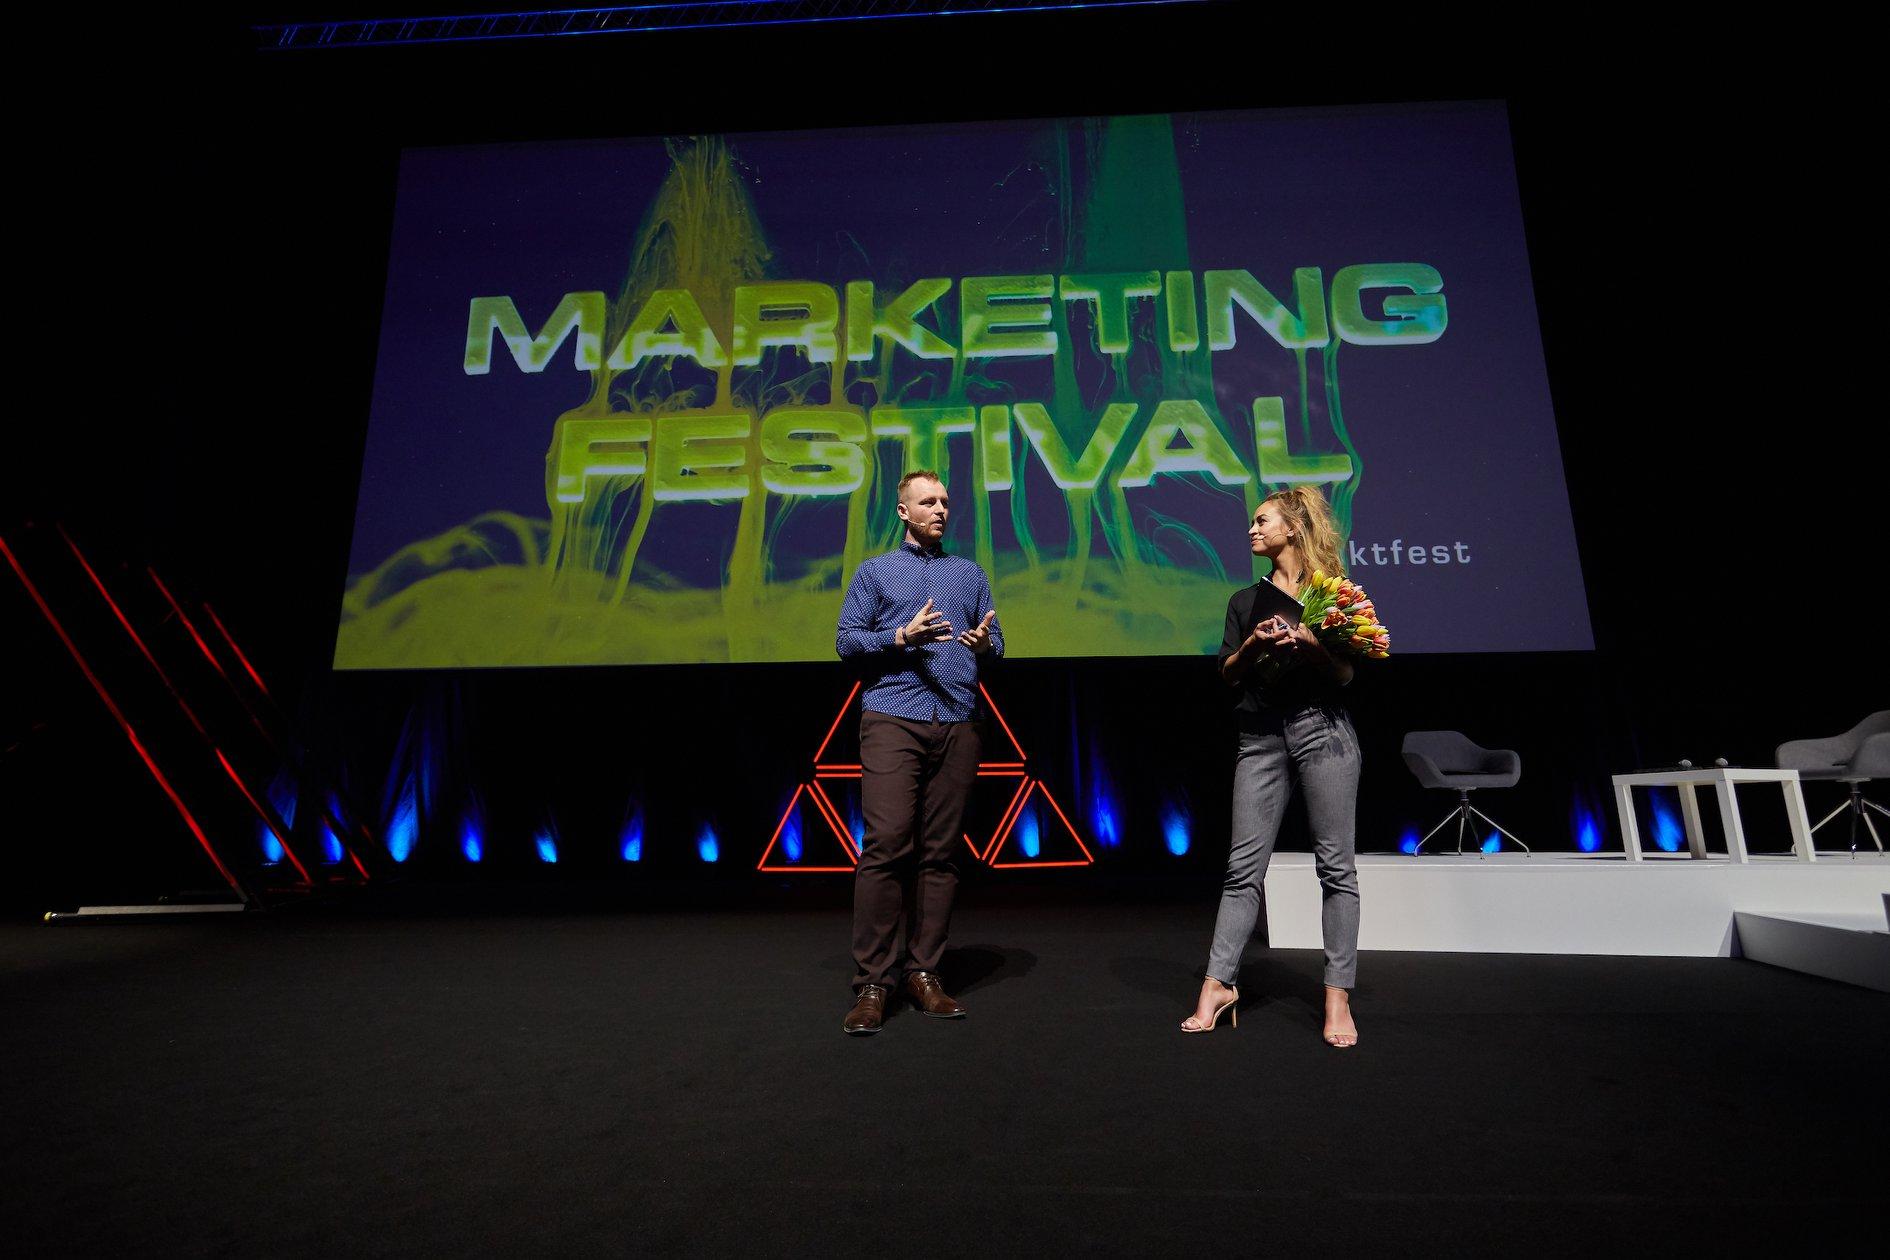 marketingfestival2019